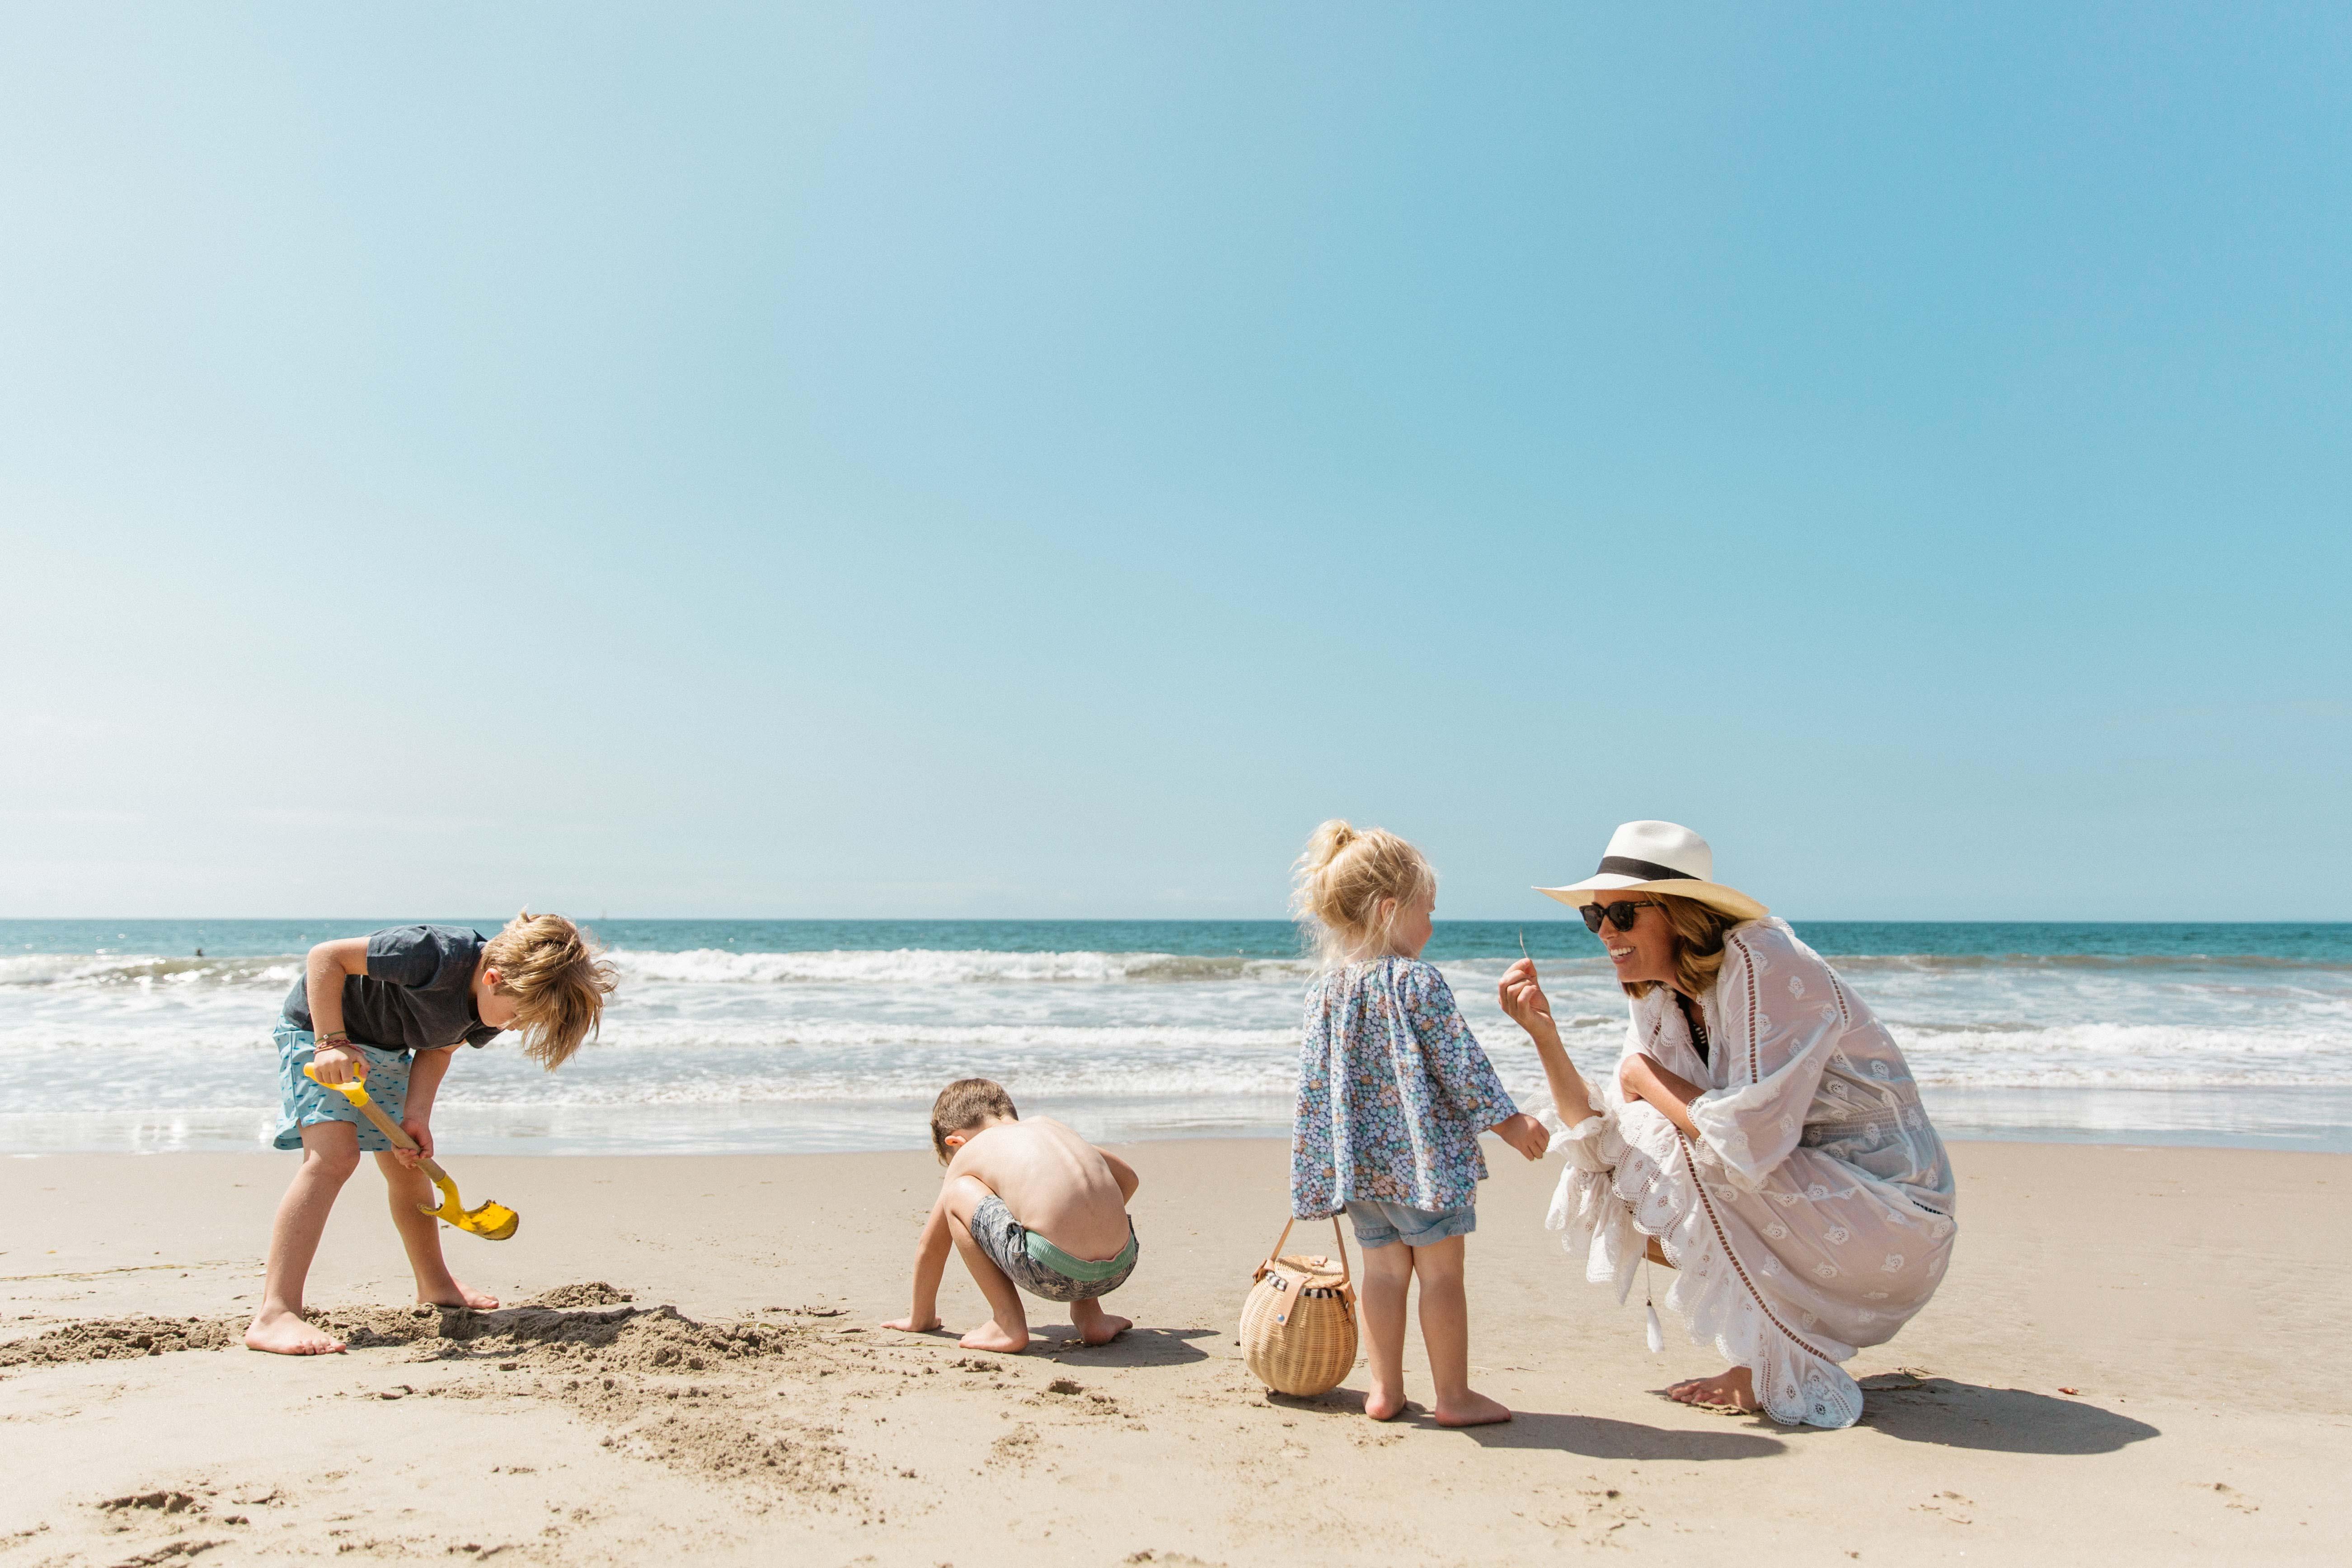 rug bath com walmart ip tufted rugs and better beach coastal gardens homes